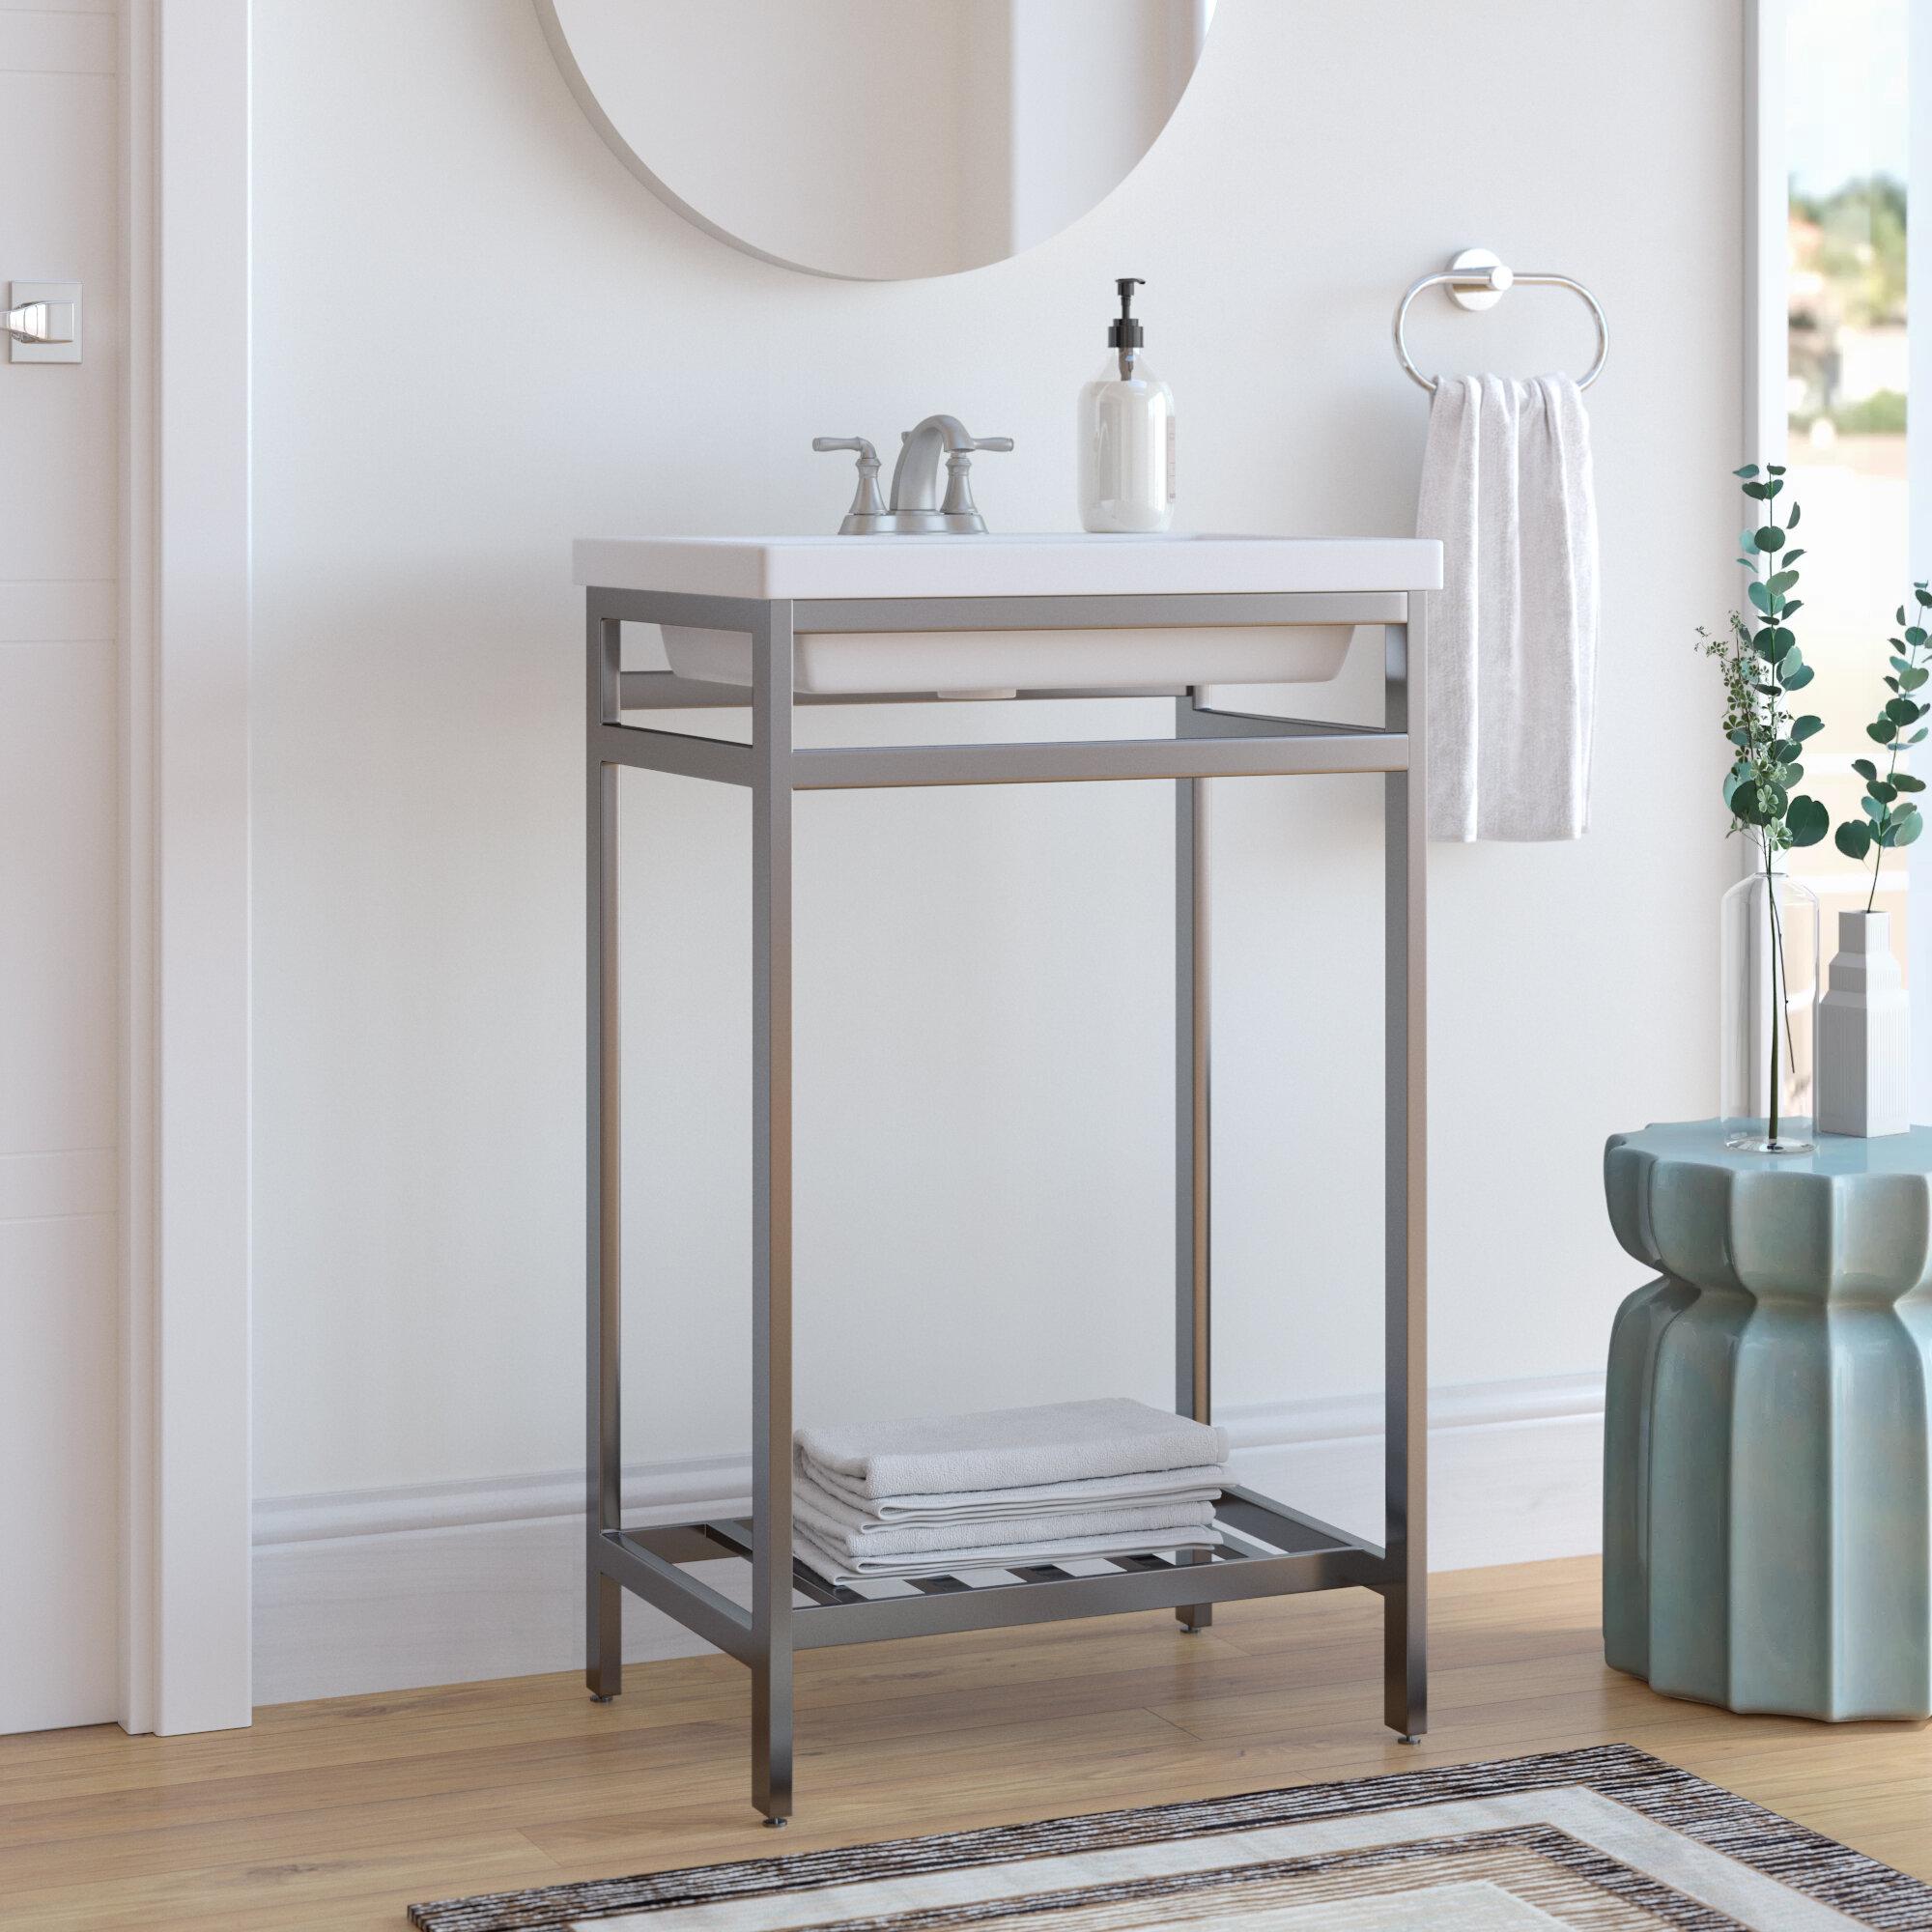 Ivy Bronx Arverne Stainless Steel Open Console 21 Single Bathroom Vanity Set Reviews Wayfair